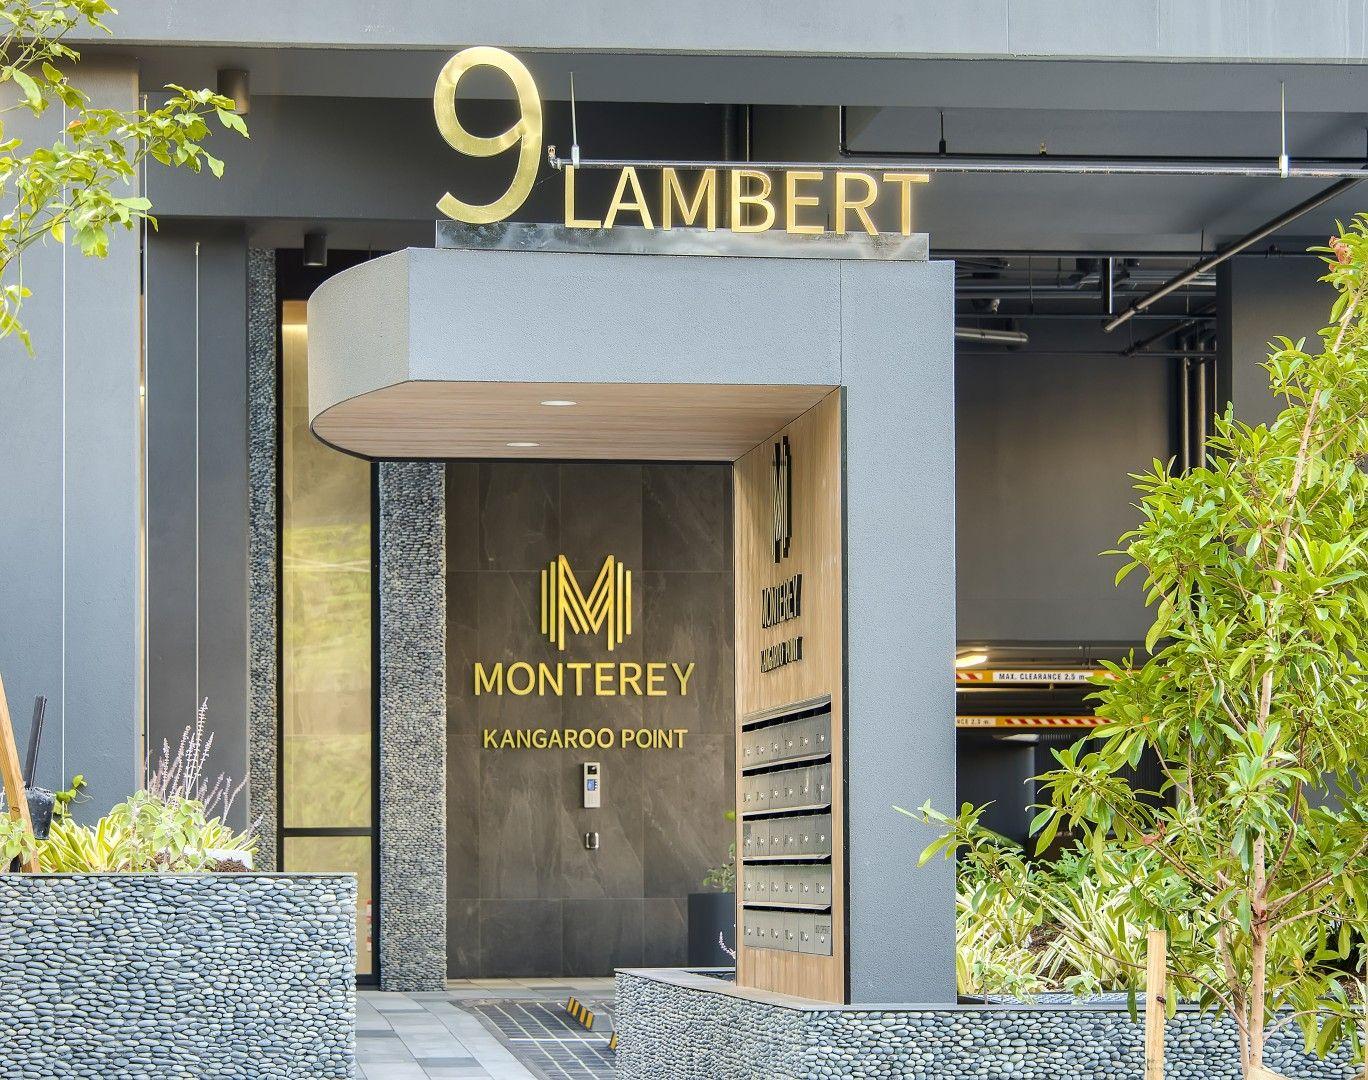 9 Lambert Street, Kangaroo Point, QLD 4169, Image 0